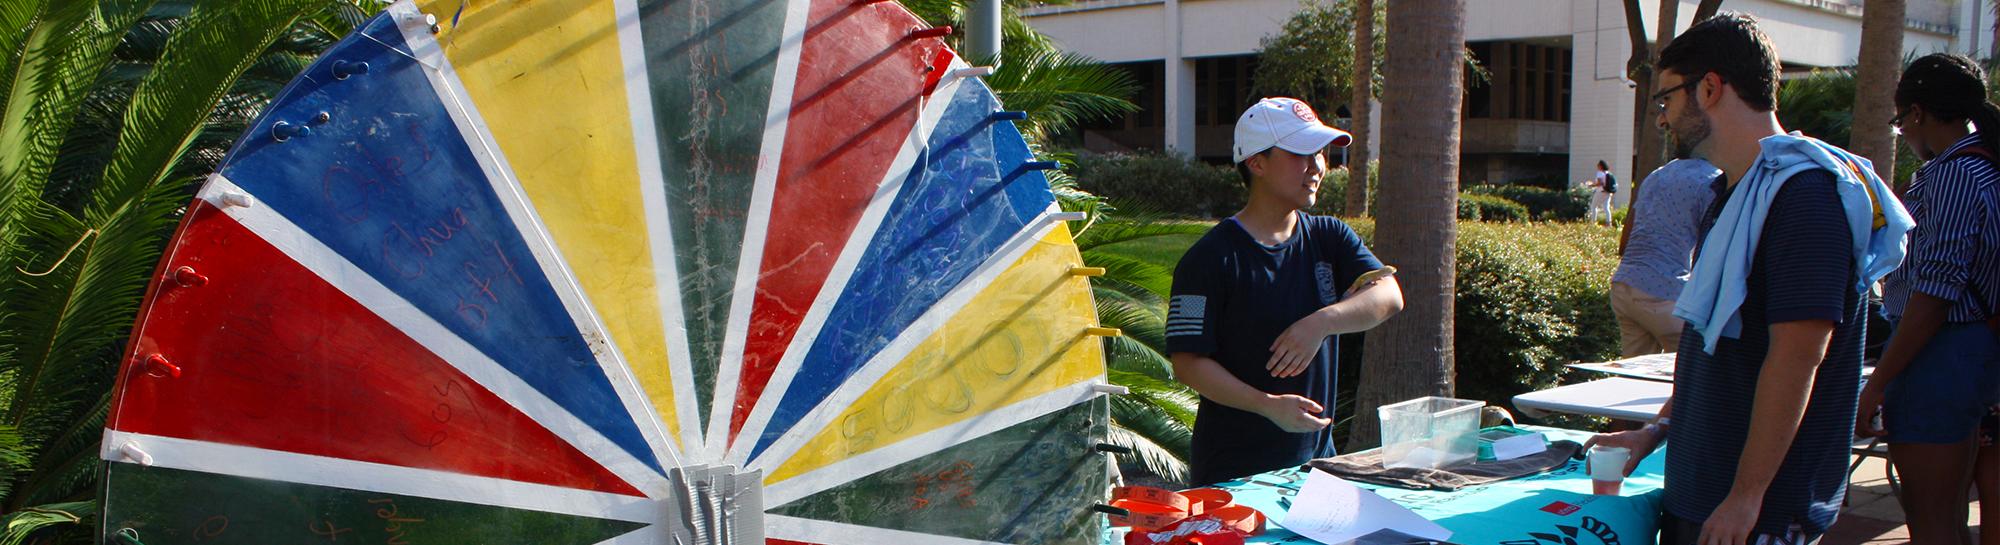 A student shows off a lizard a the Plazapalooza organization carnival